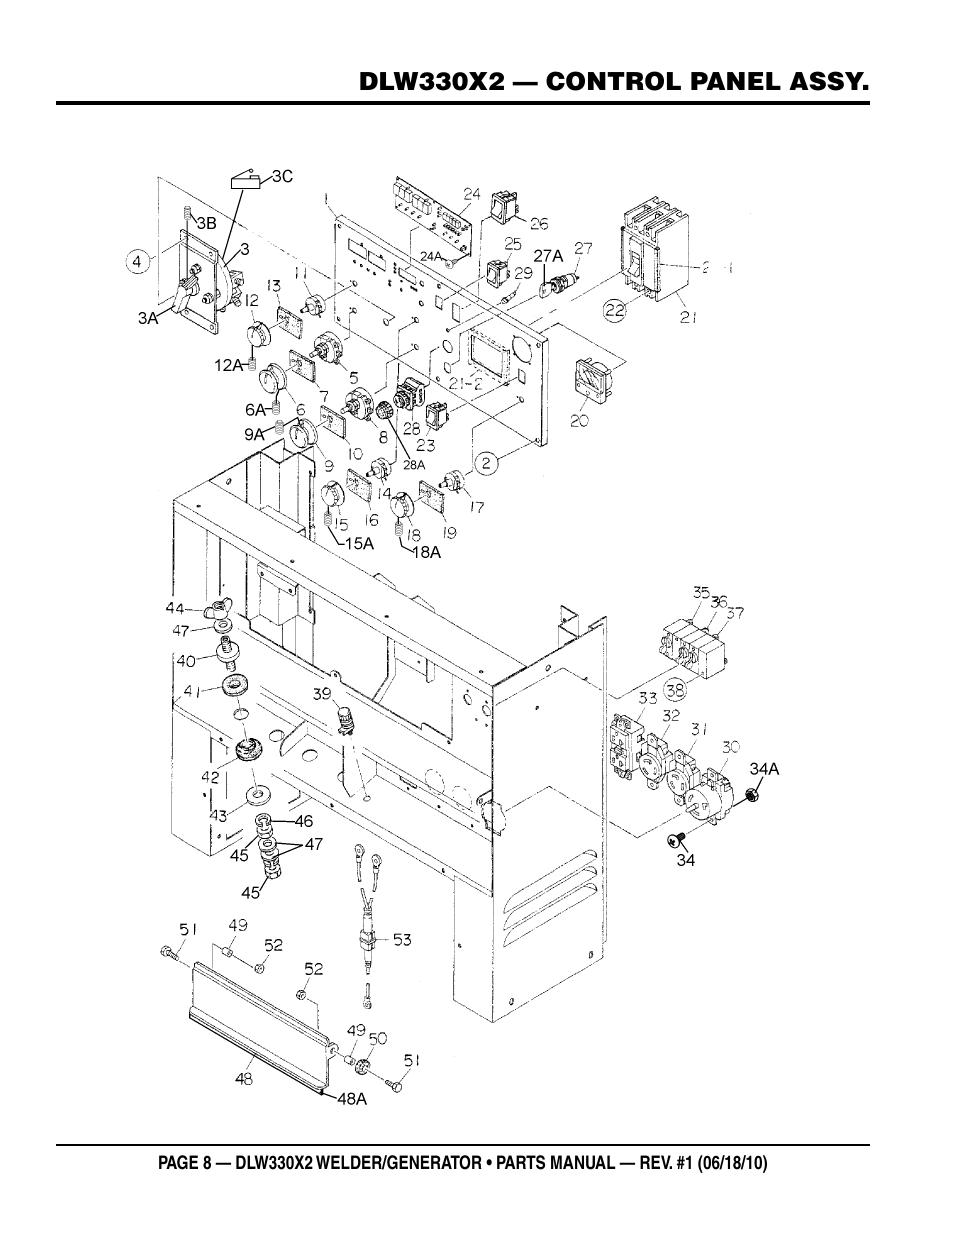 Multiquip WElDEr/gEnEratOr (KuBOta D902E3BWDDE2 DIEsEl